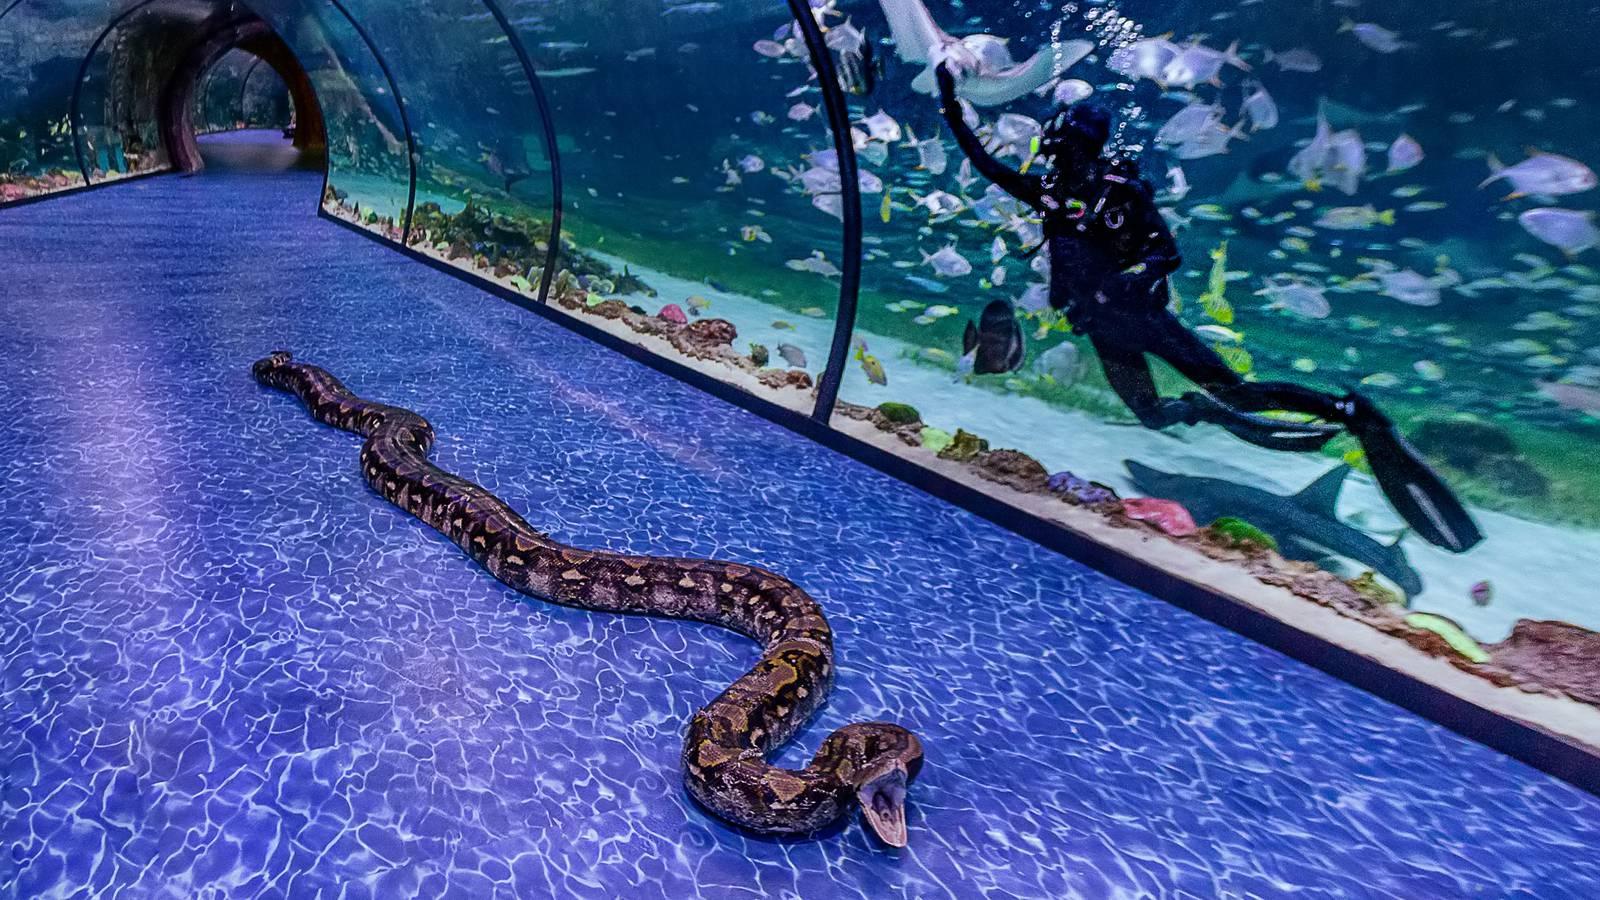 Al Qana Super Snake - New attraction of National Aquarium, Abu Dhabi